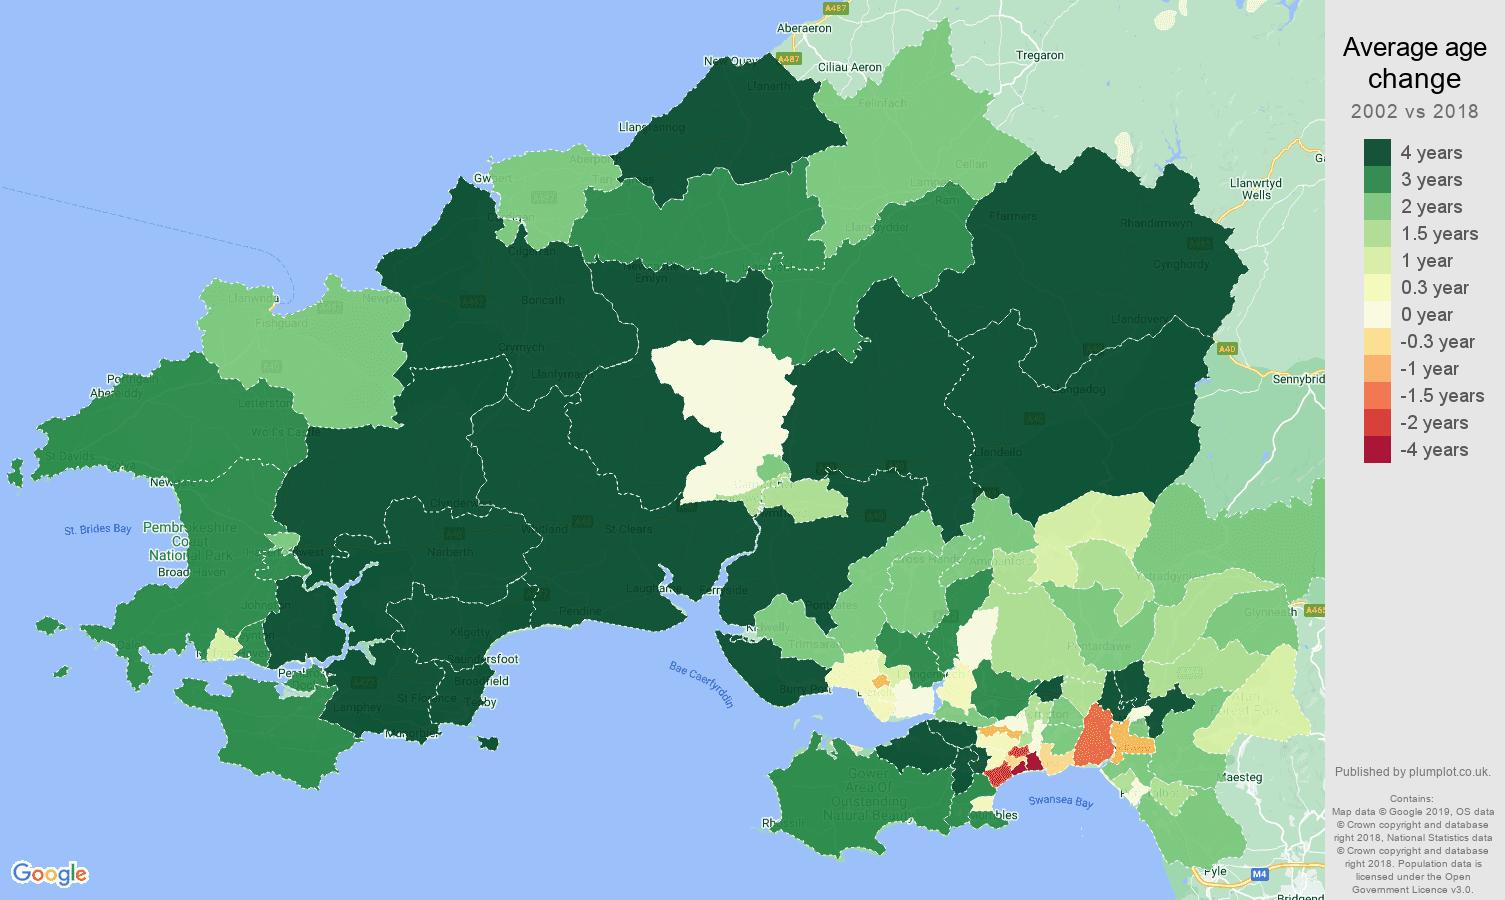 Swansea average age change map